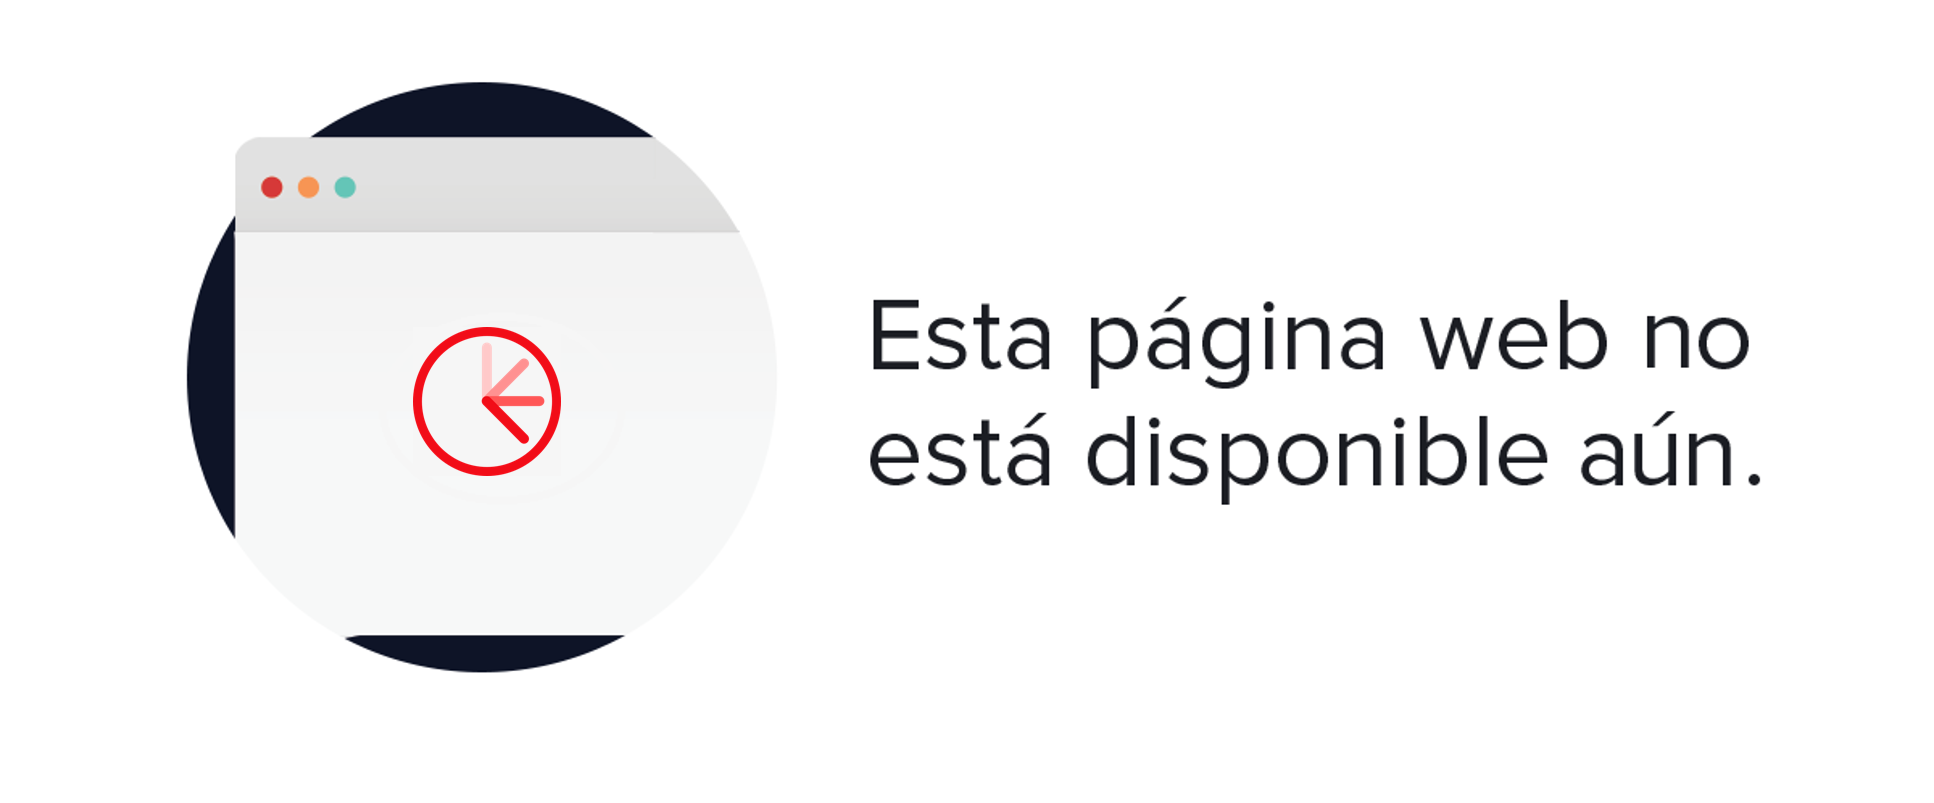 Ash Blanco Zapatillas Deportivas Hombre 425602 - Barato - MQGXLKM